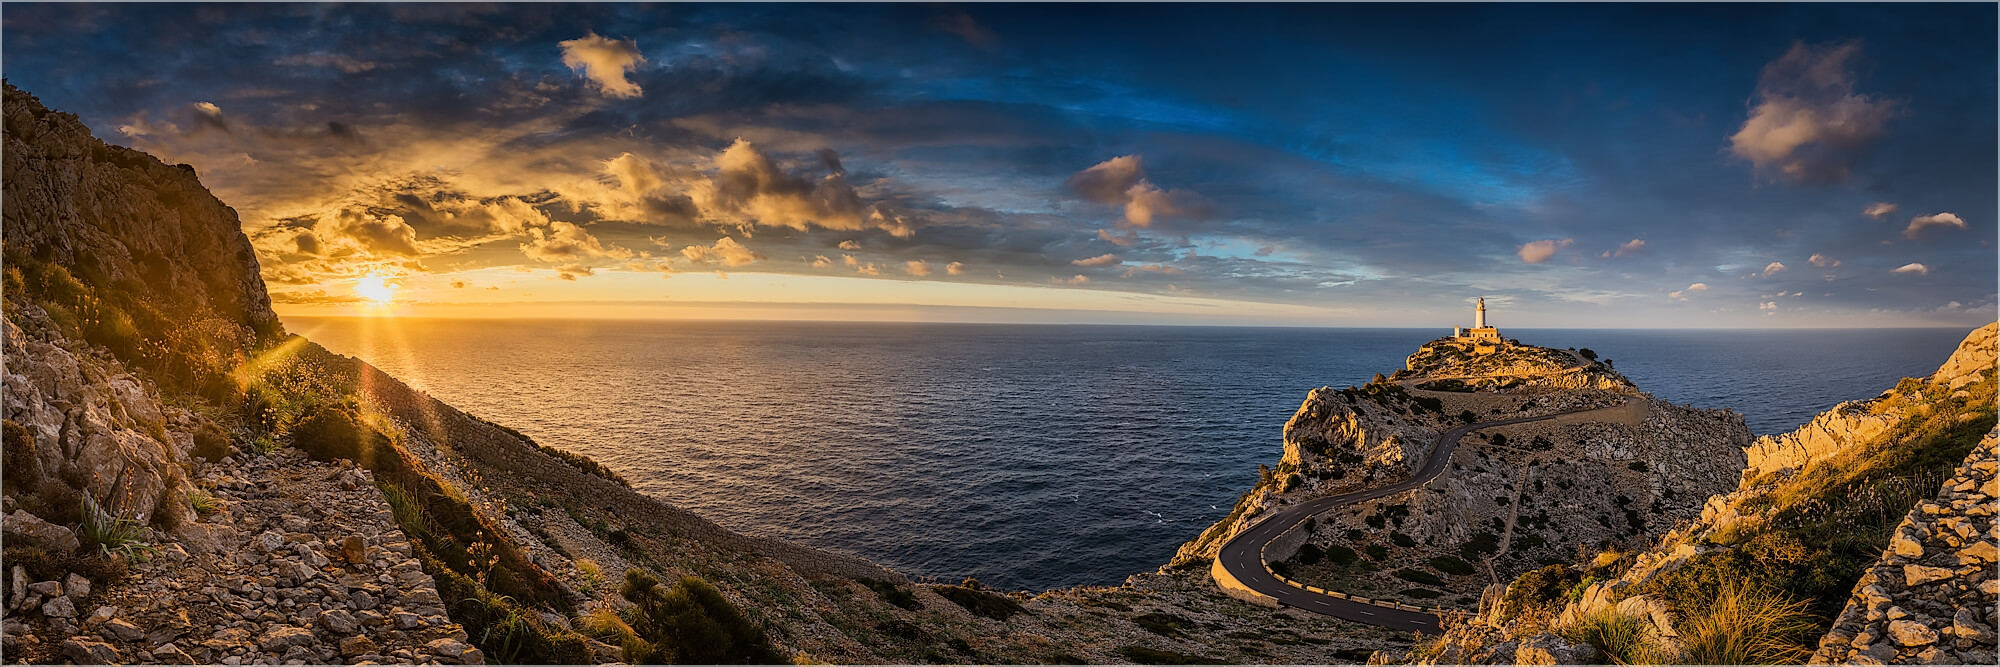 Panoramabild Sonnenuntergang Cap Formentor Mallorca